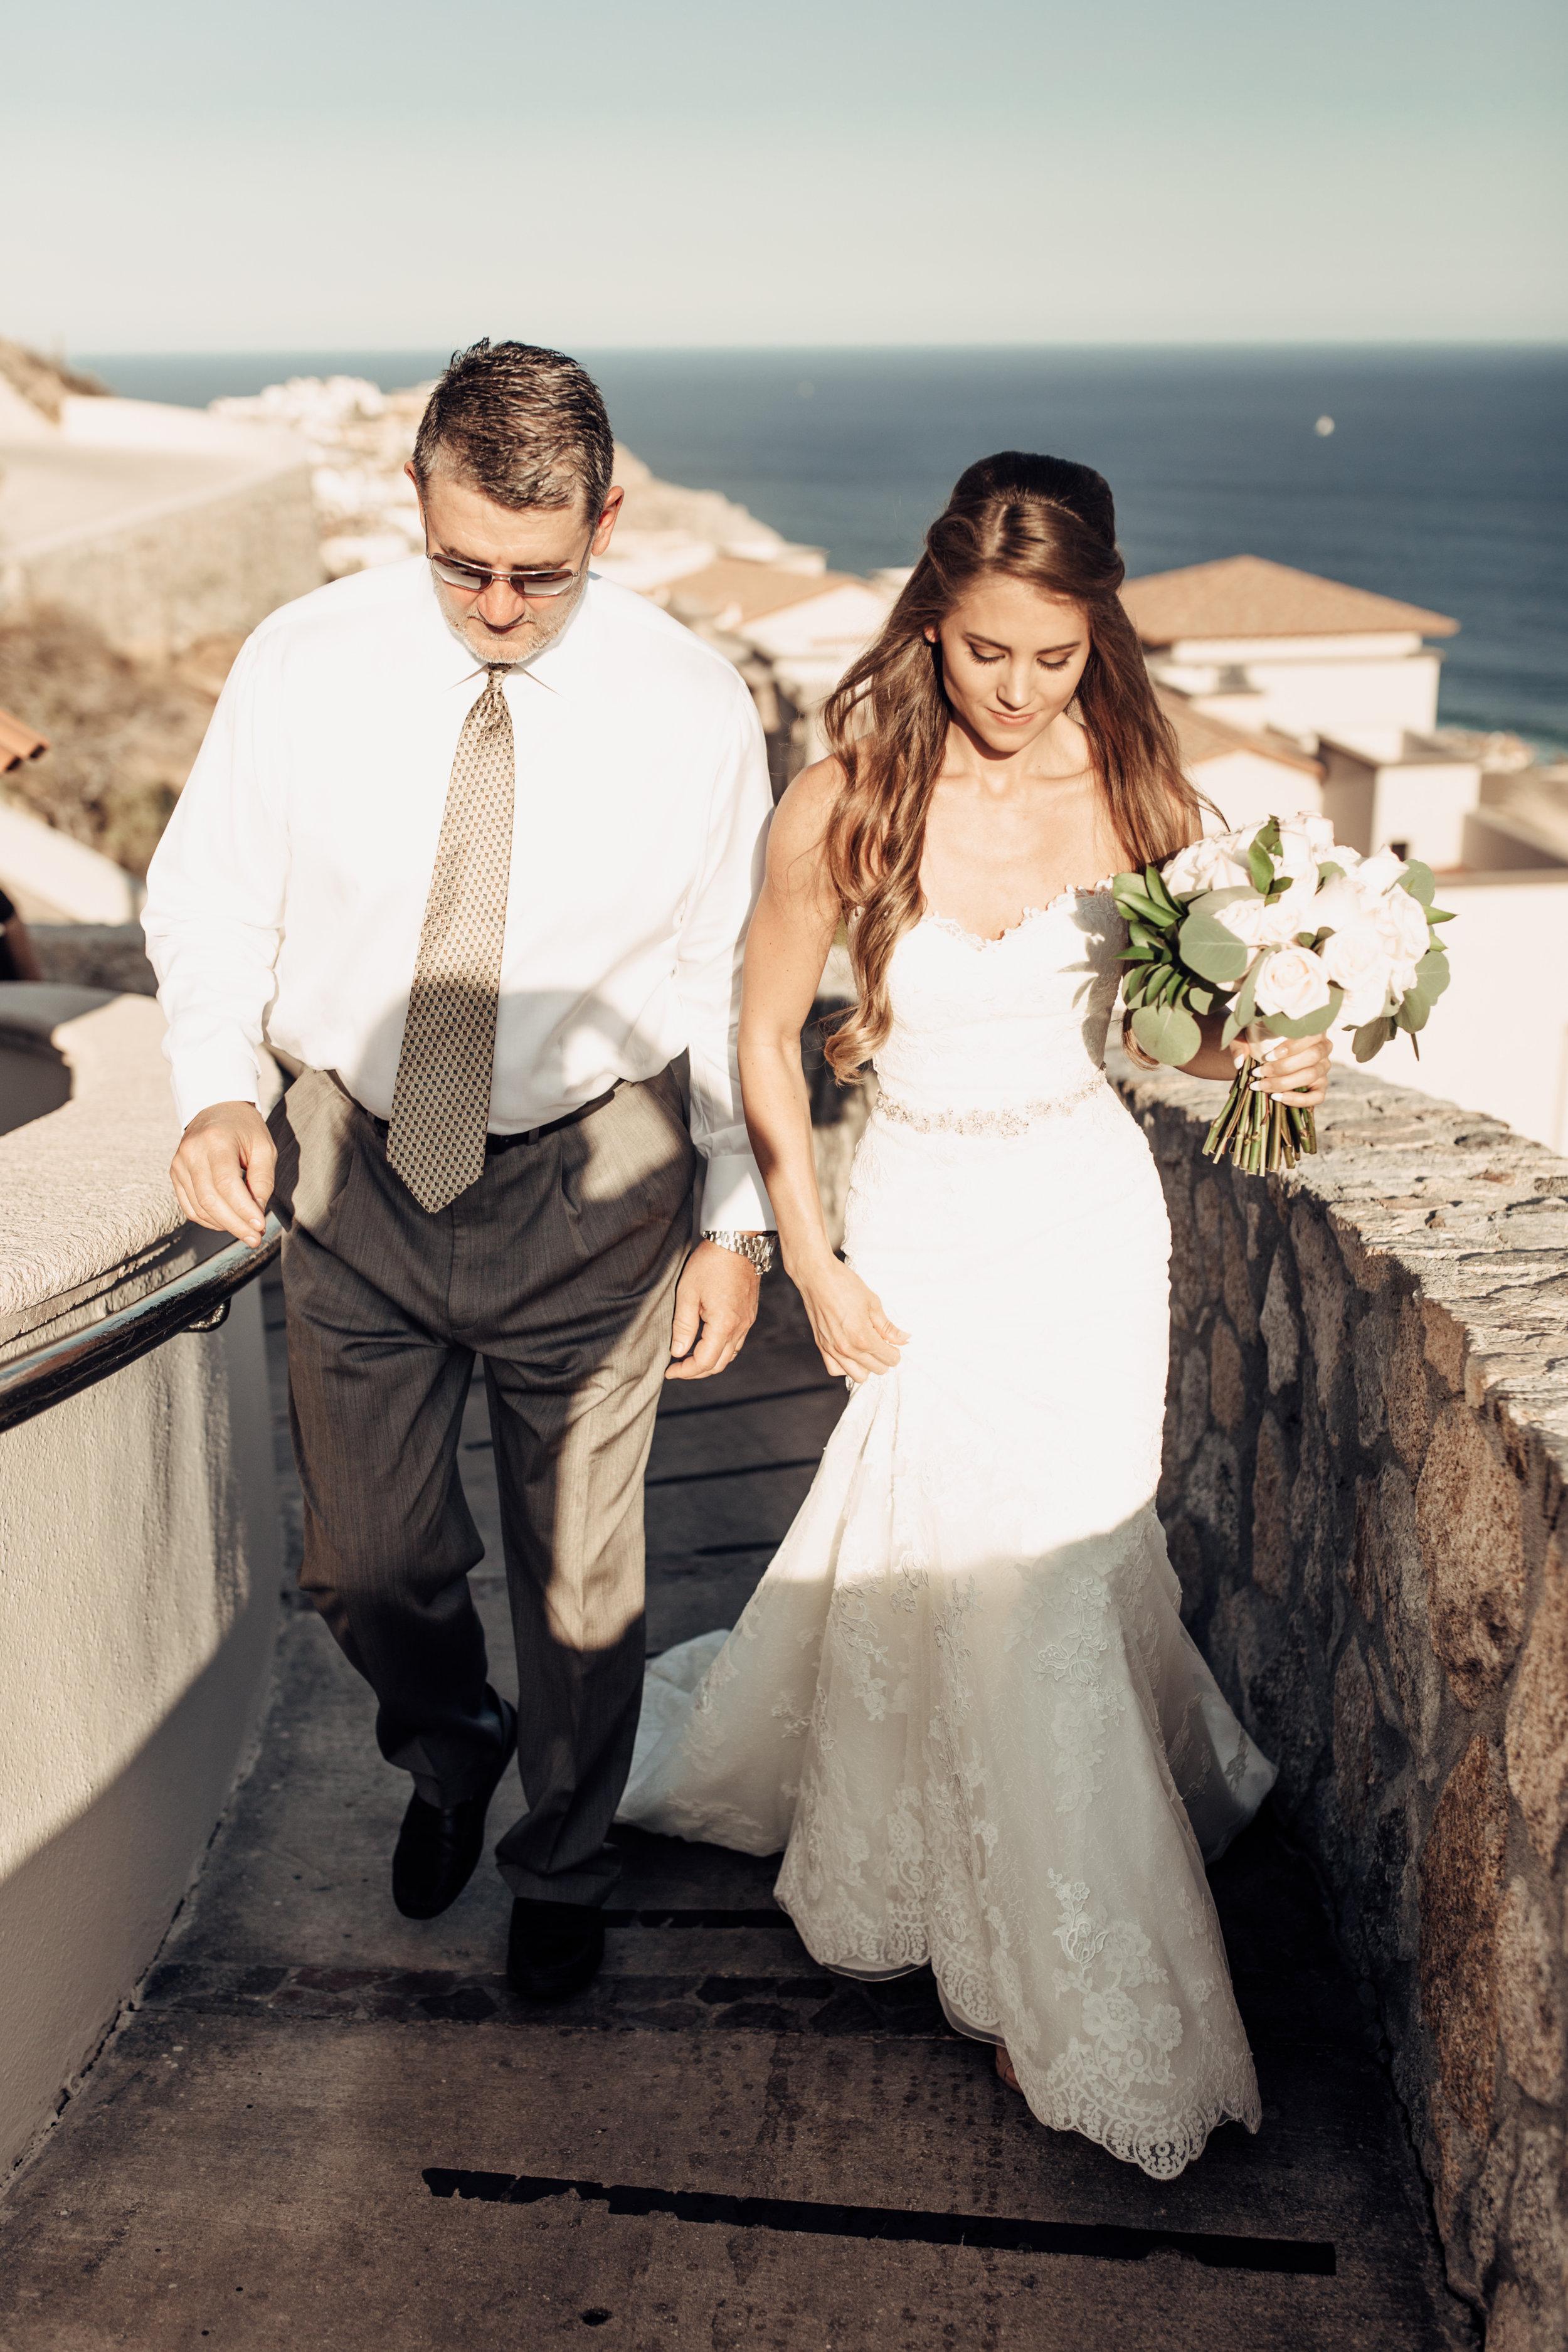 pueblo-bonito-sunset-beach-wedding-cabo-san-lucas292.jpg